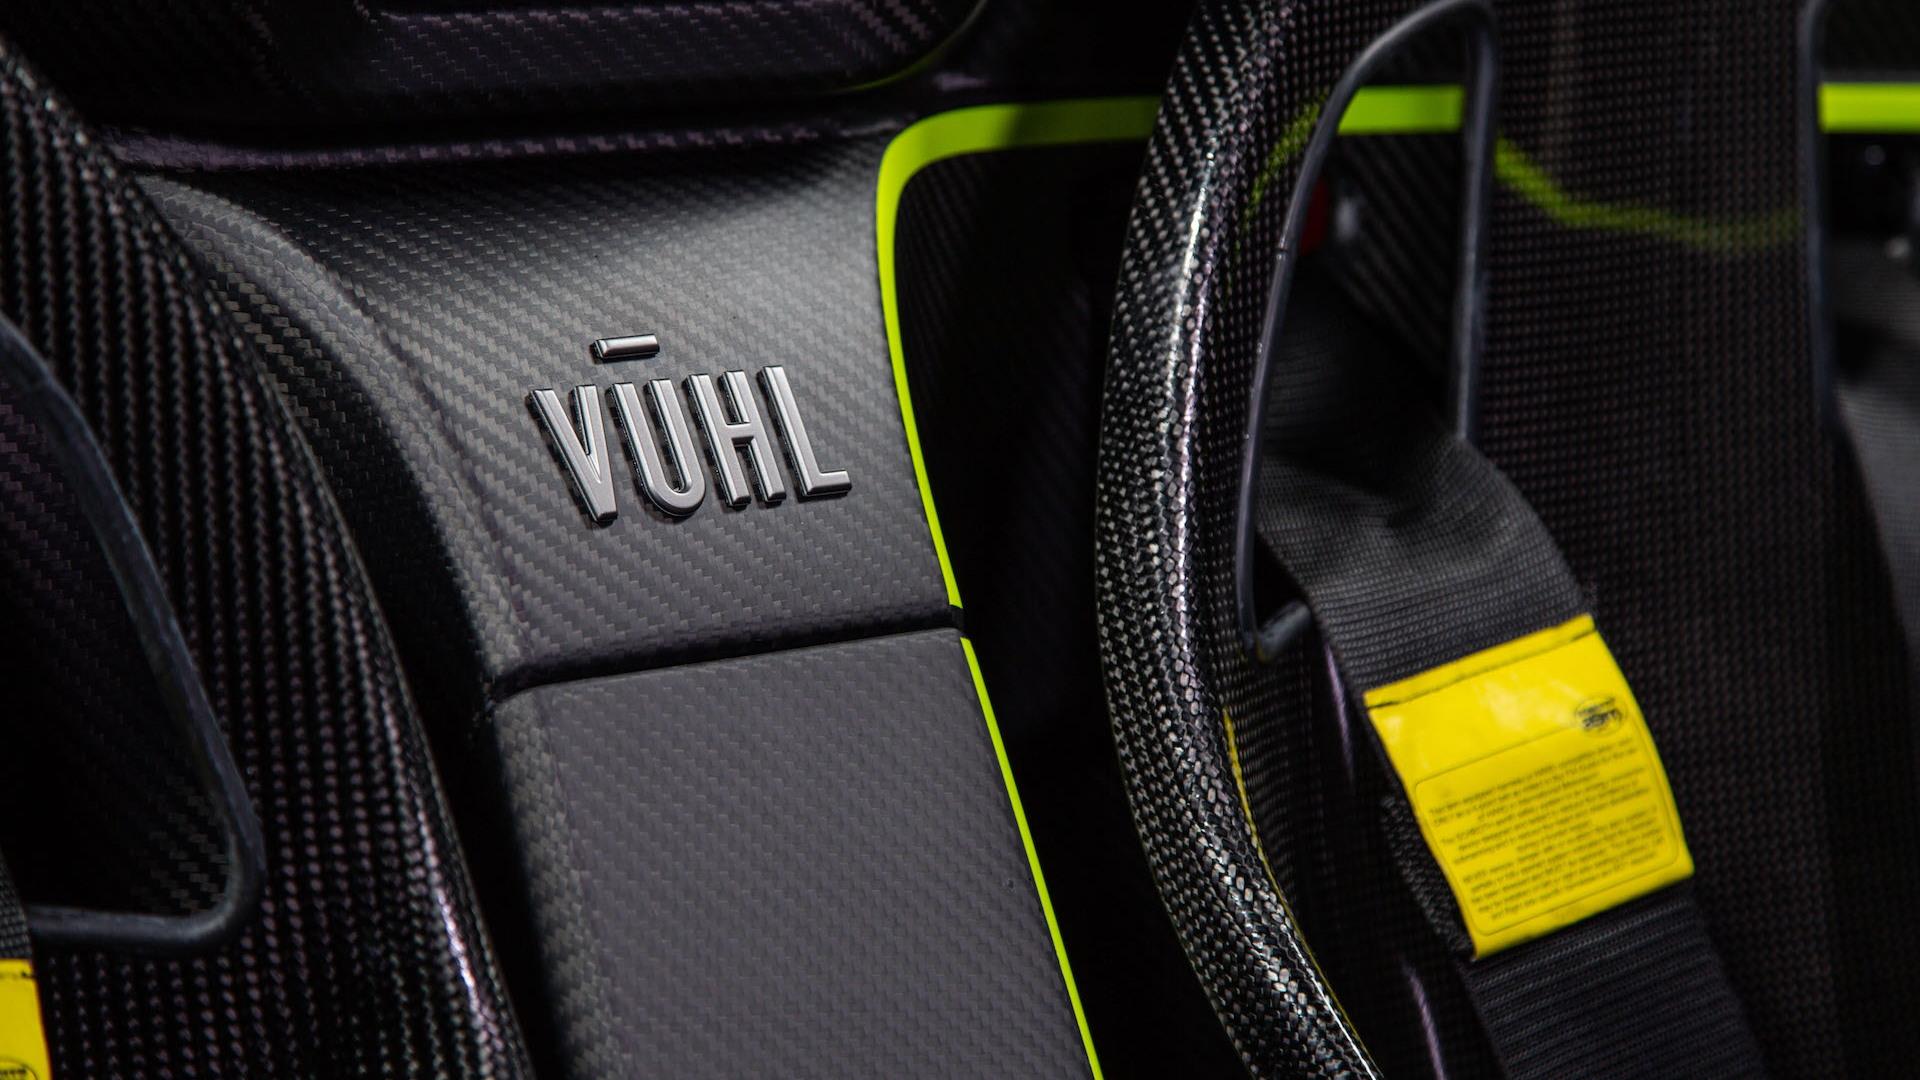 Vuhl 05RR sports car, 2019